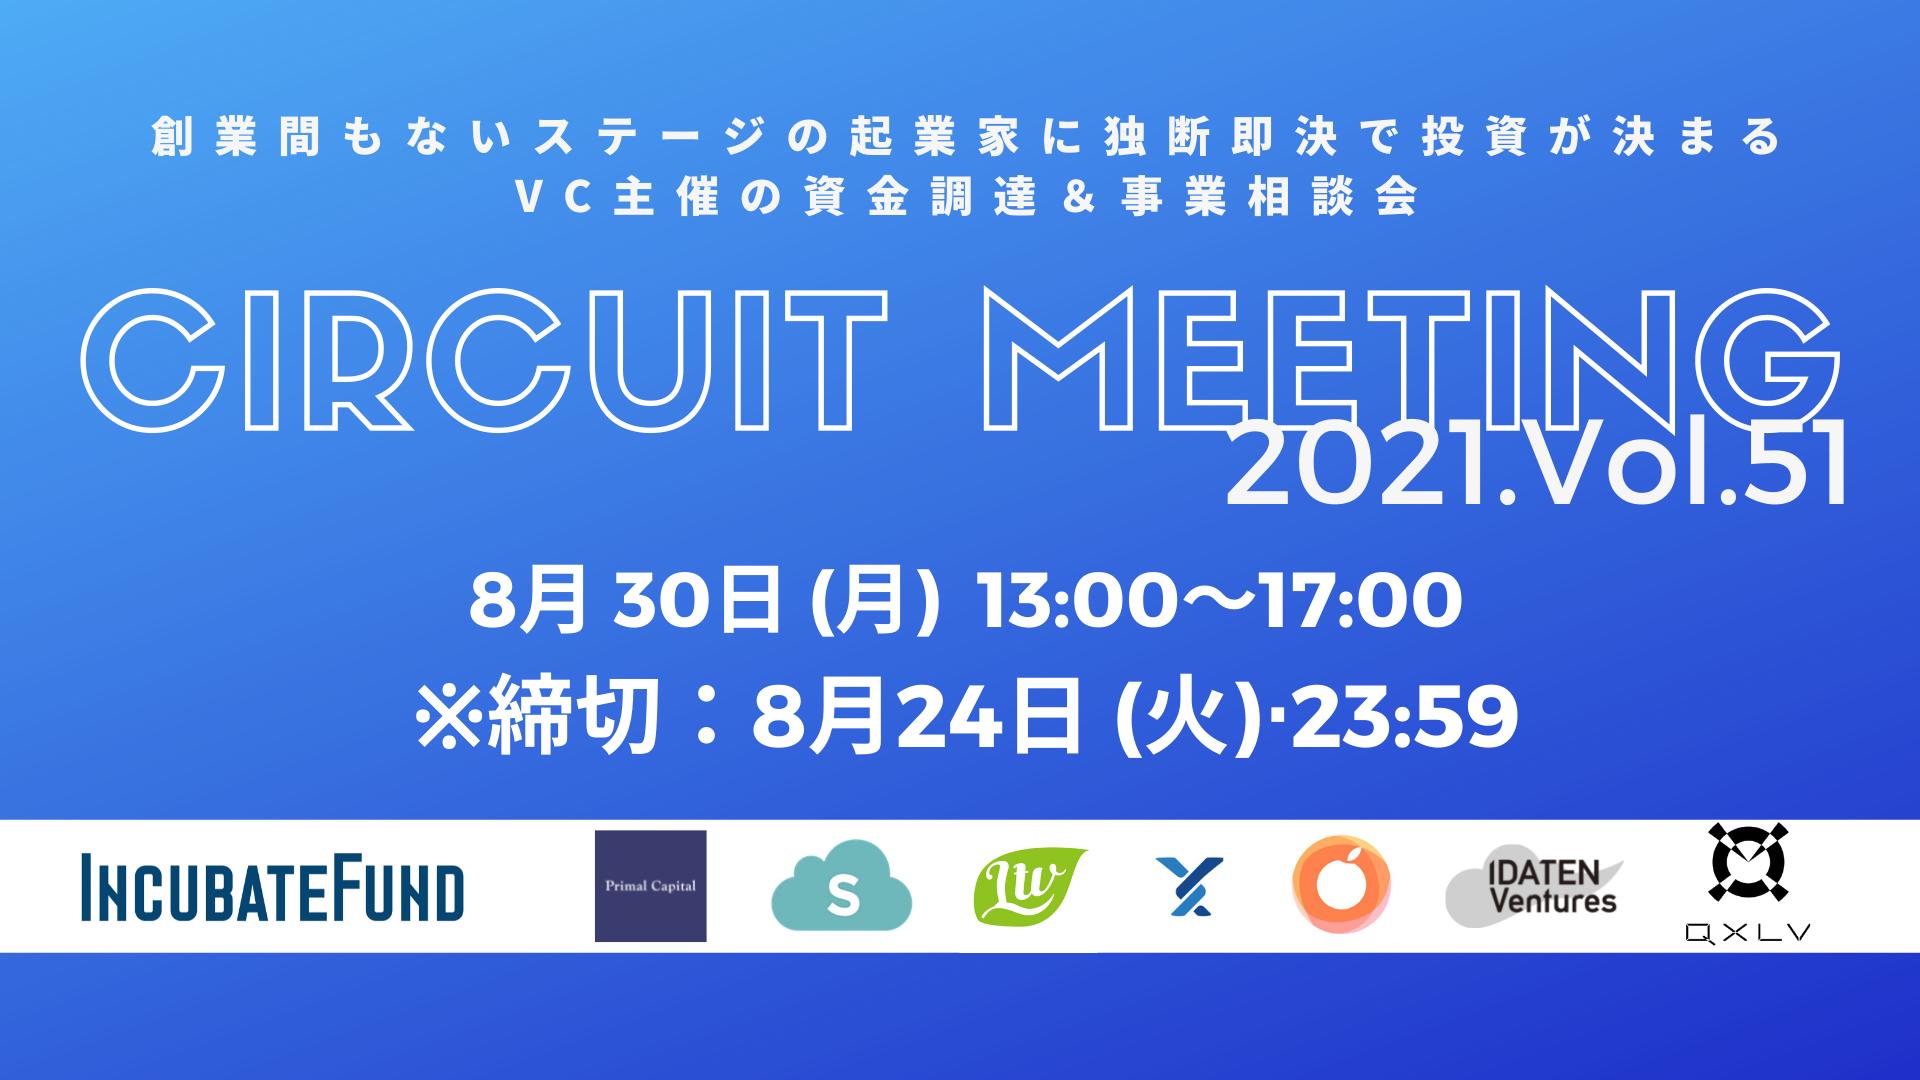 【8/24締切】Circuit Meeting Vol.51